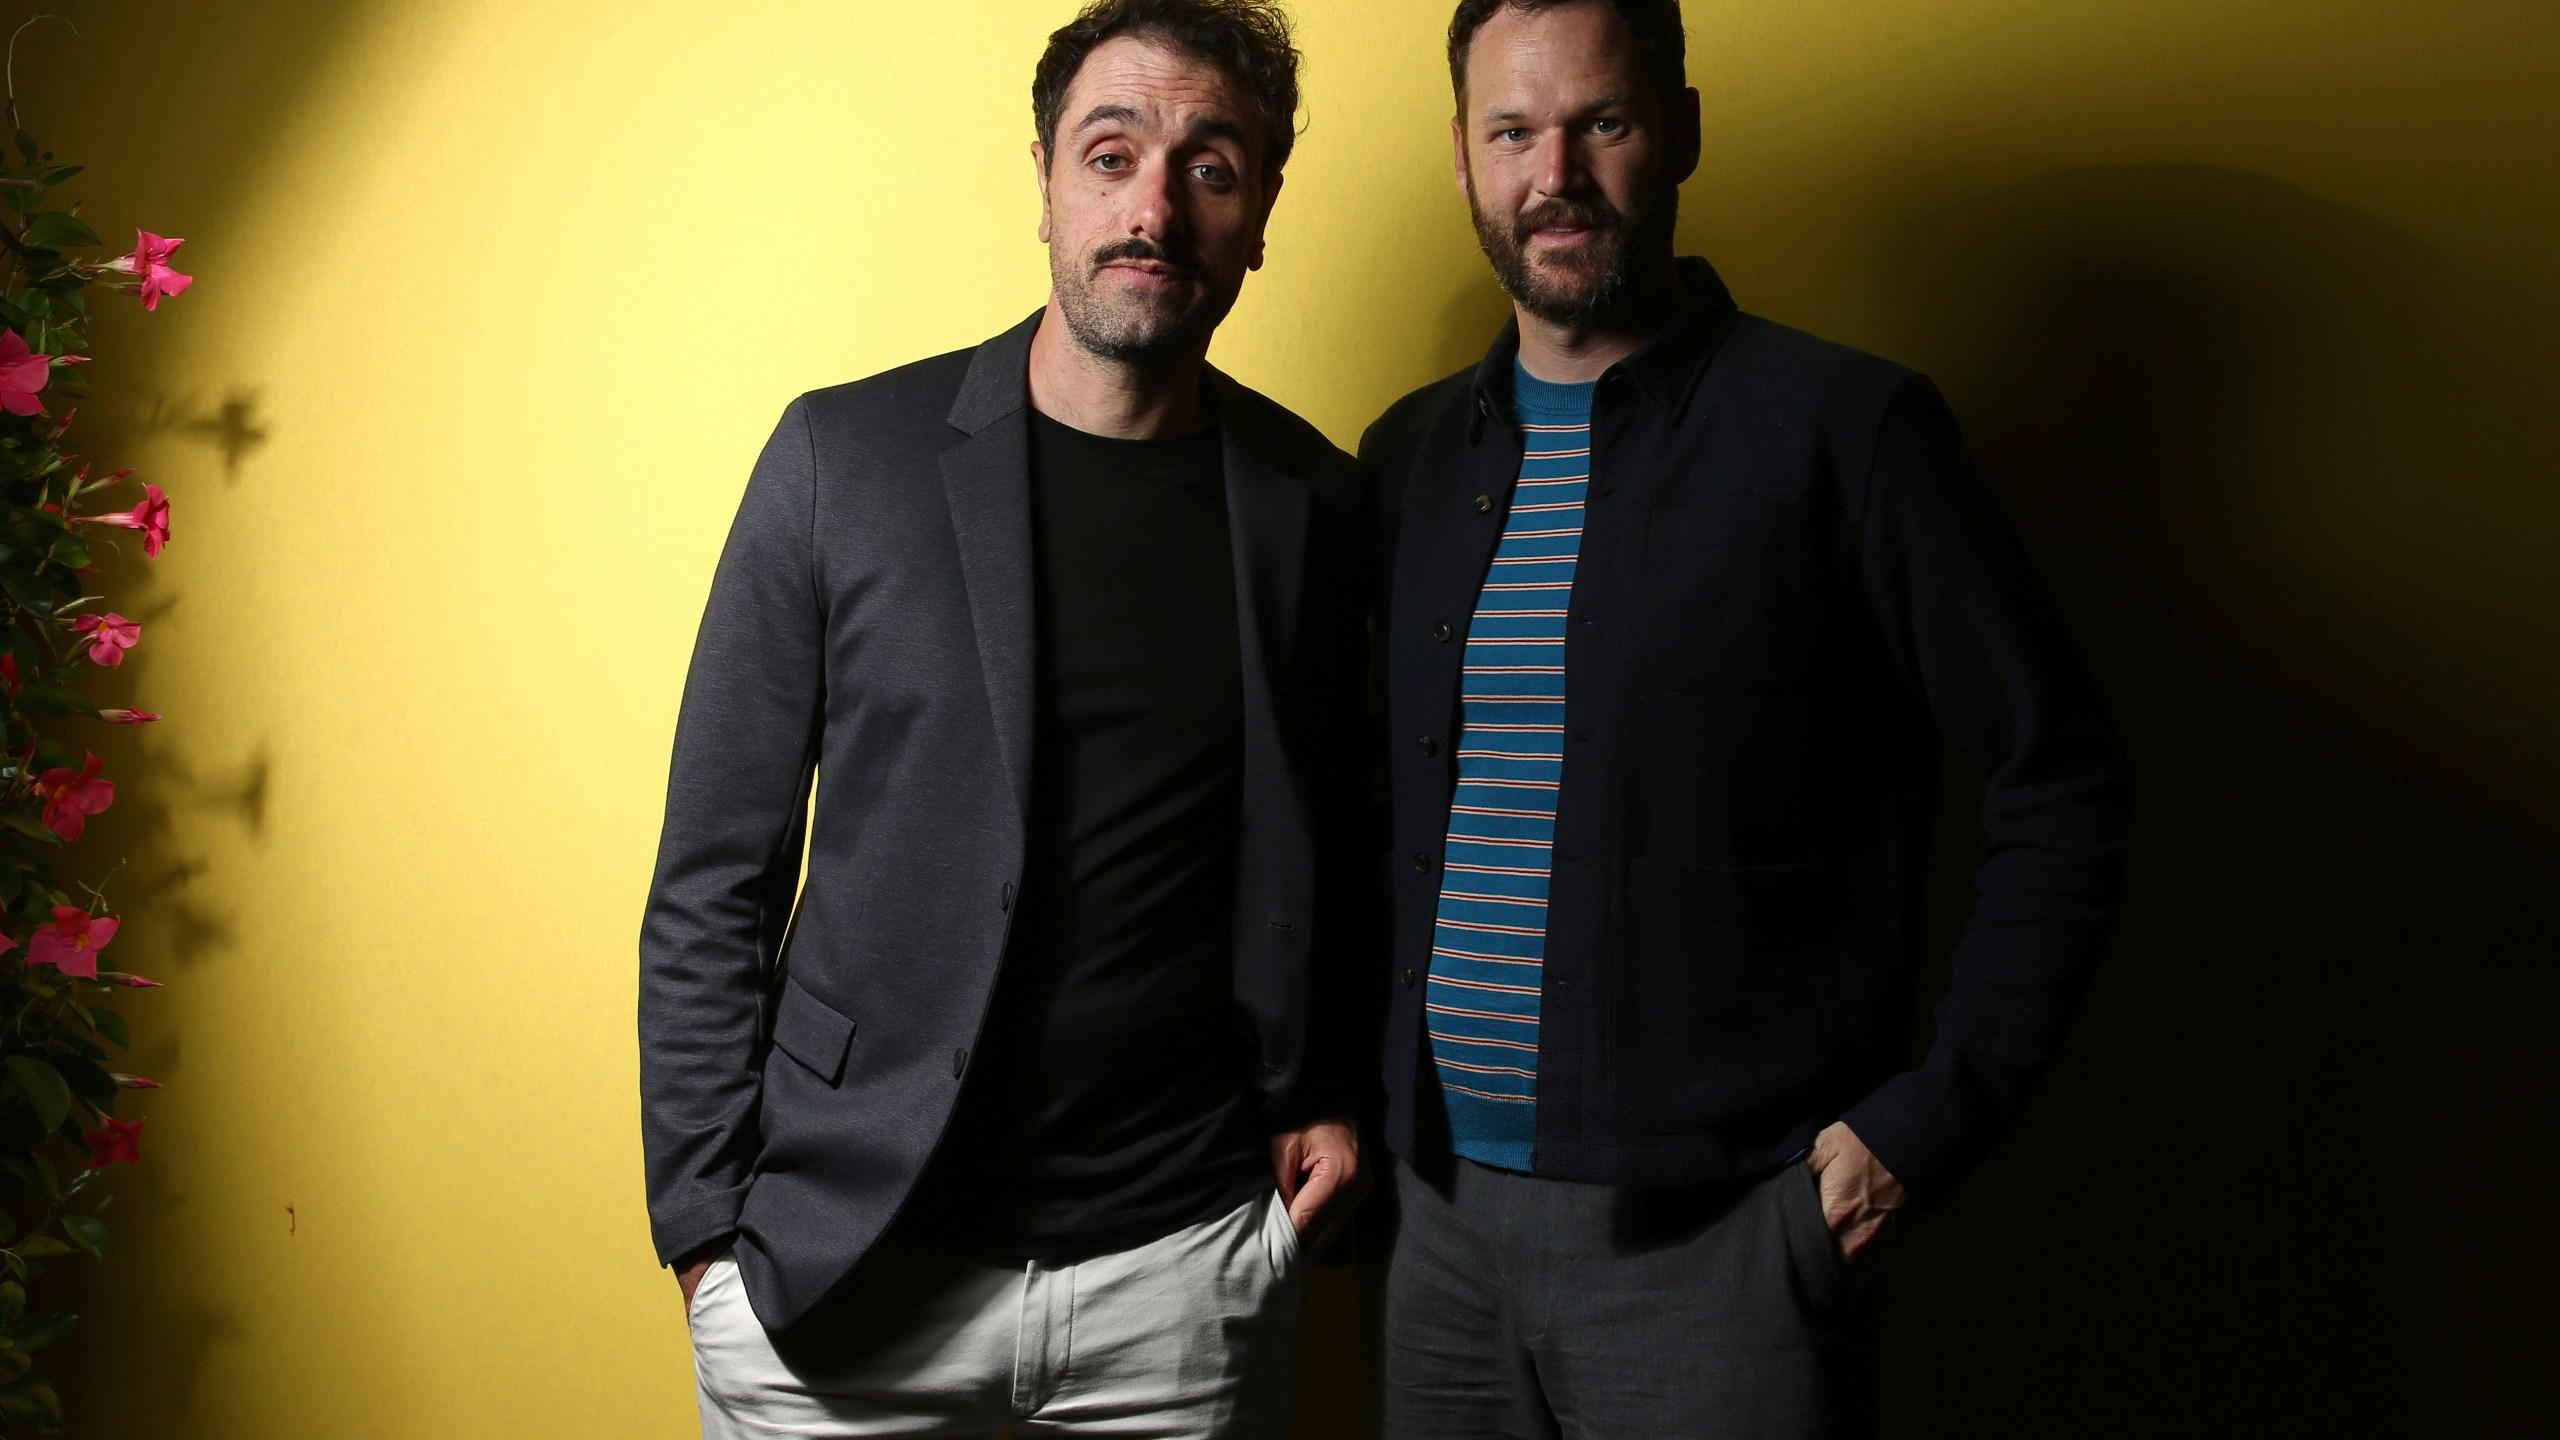 Michael Angelo Covino, Kyle Marvin